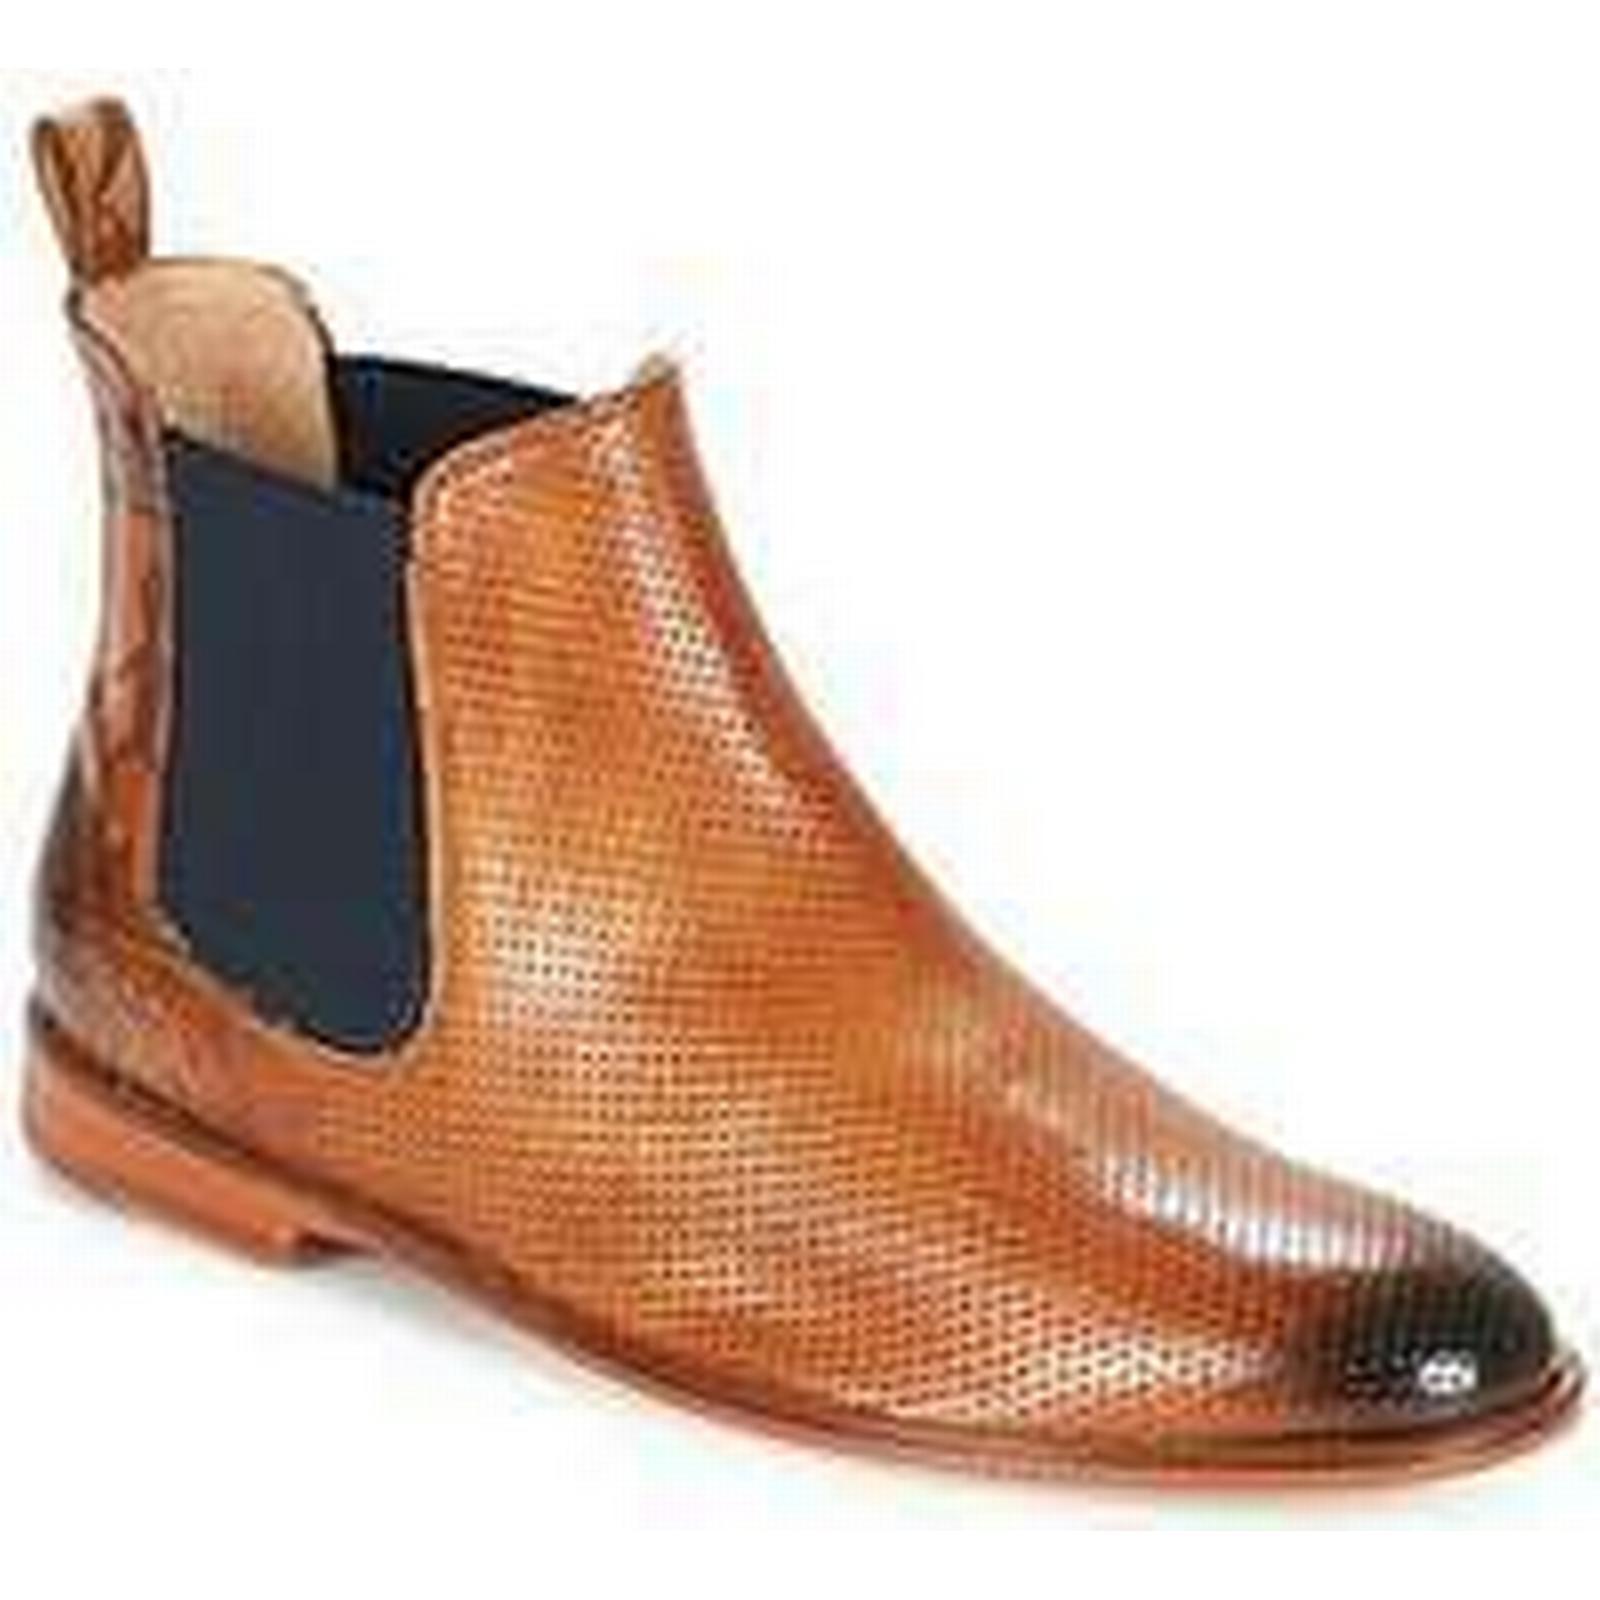 d2276795cf8d6e Spartoo.co.uk Melvin Hamilton SUSAN SUSAN SUSAN 10 A women s Mid Boots ...